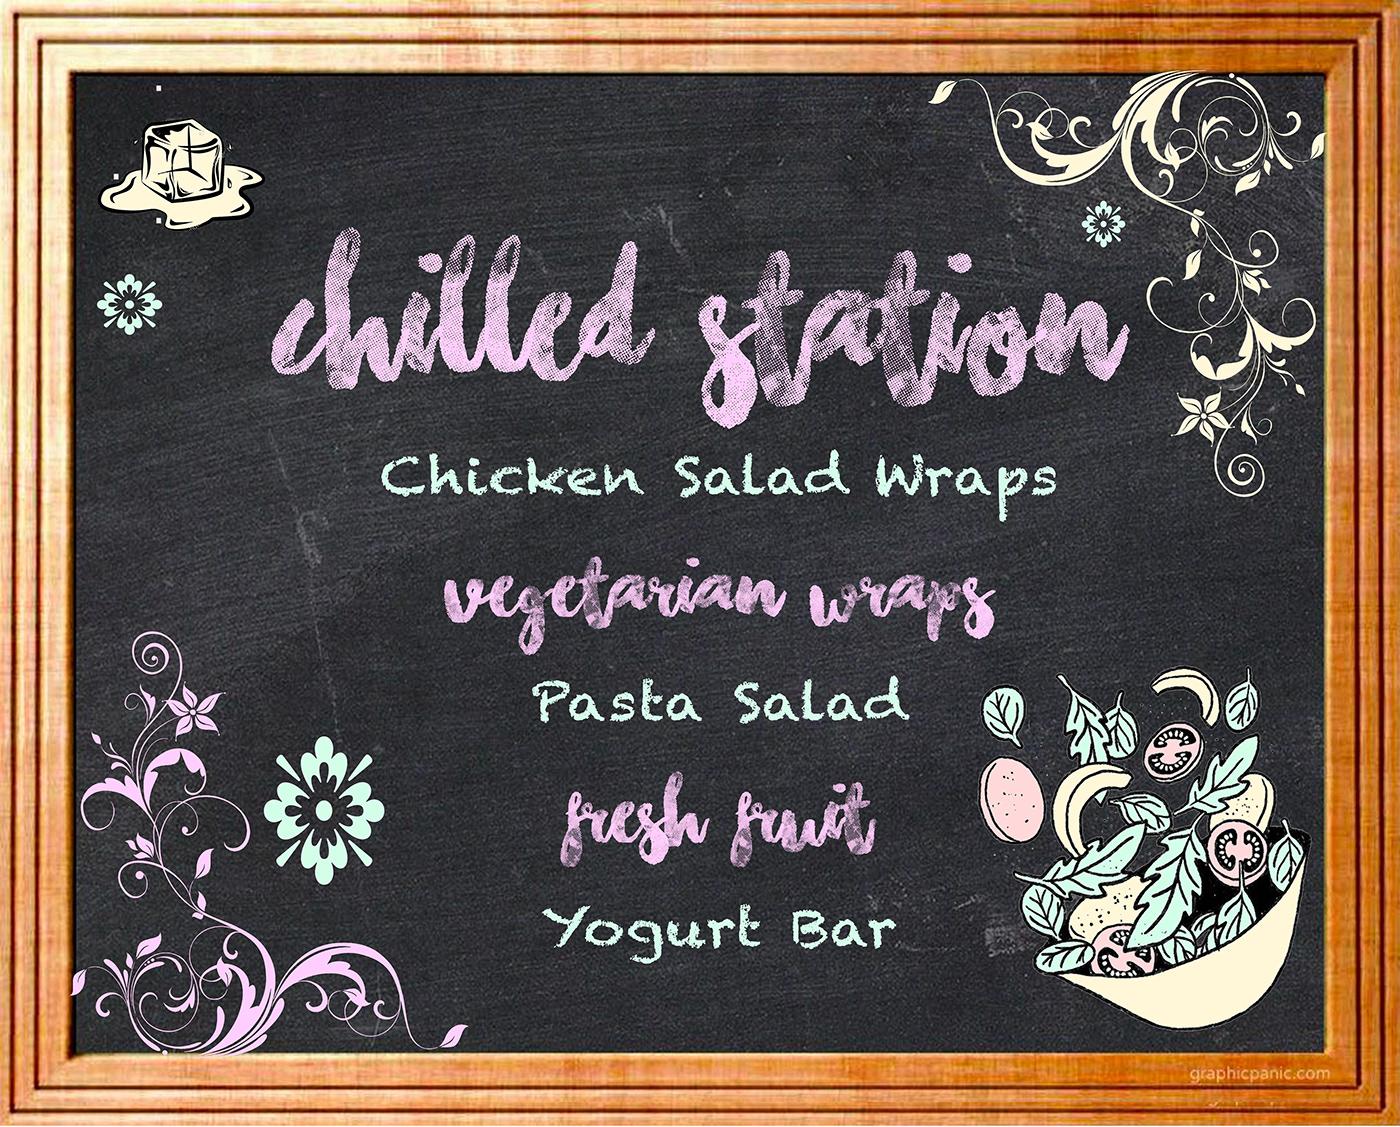 Image may contain: handwriting, blackboard and menu